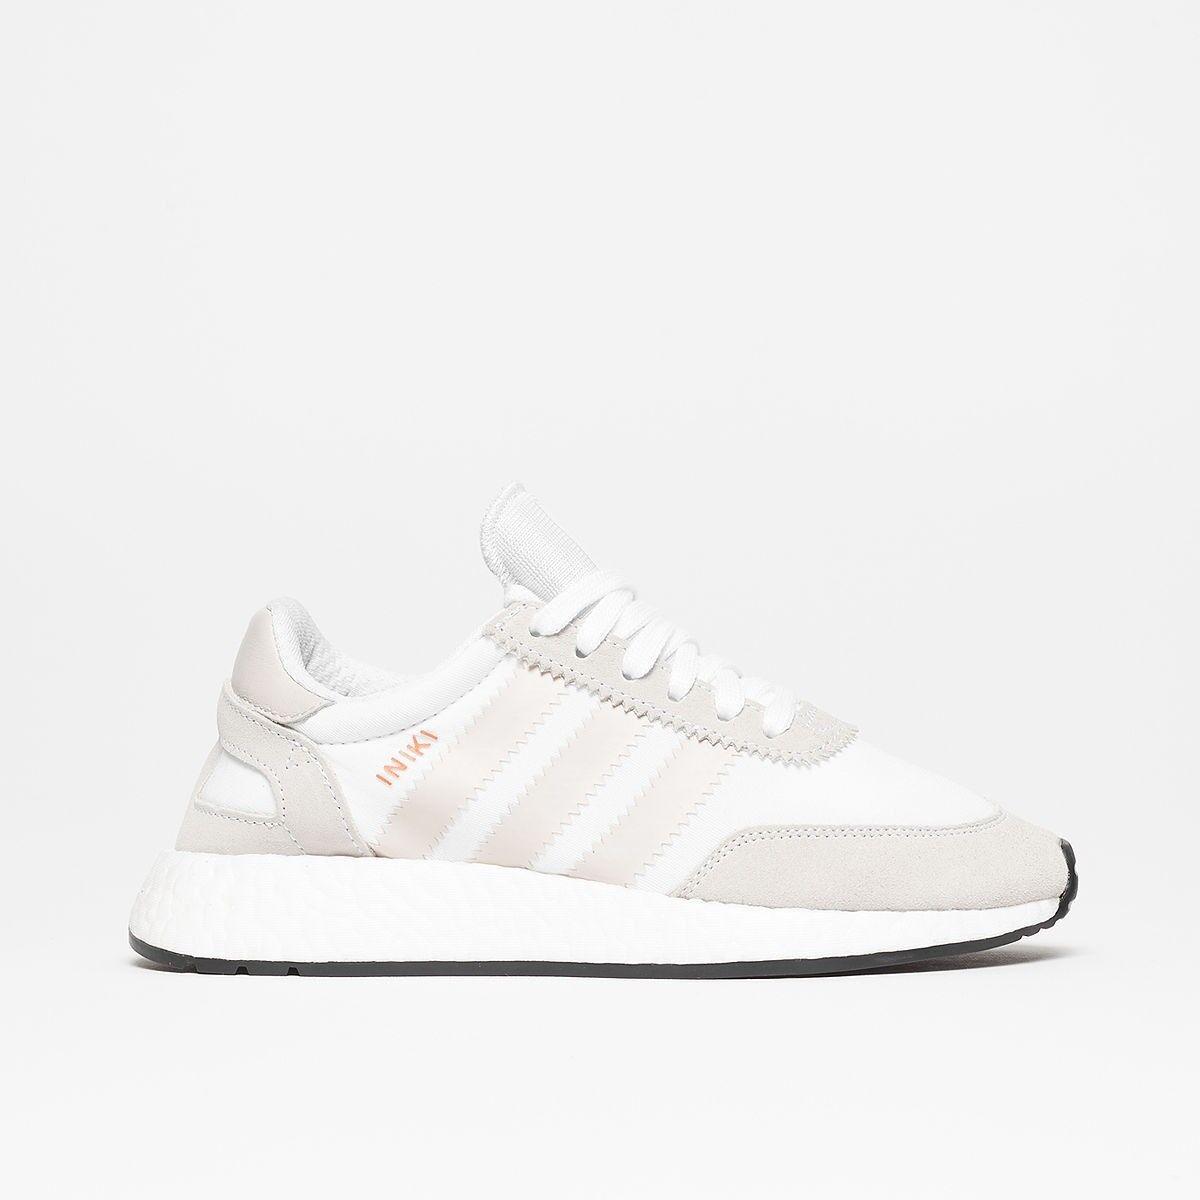 Billig Adidas hohe Qualität Adidas Billig Originals Iniki 44 2/3 54cb27